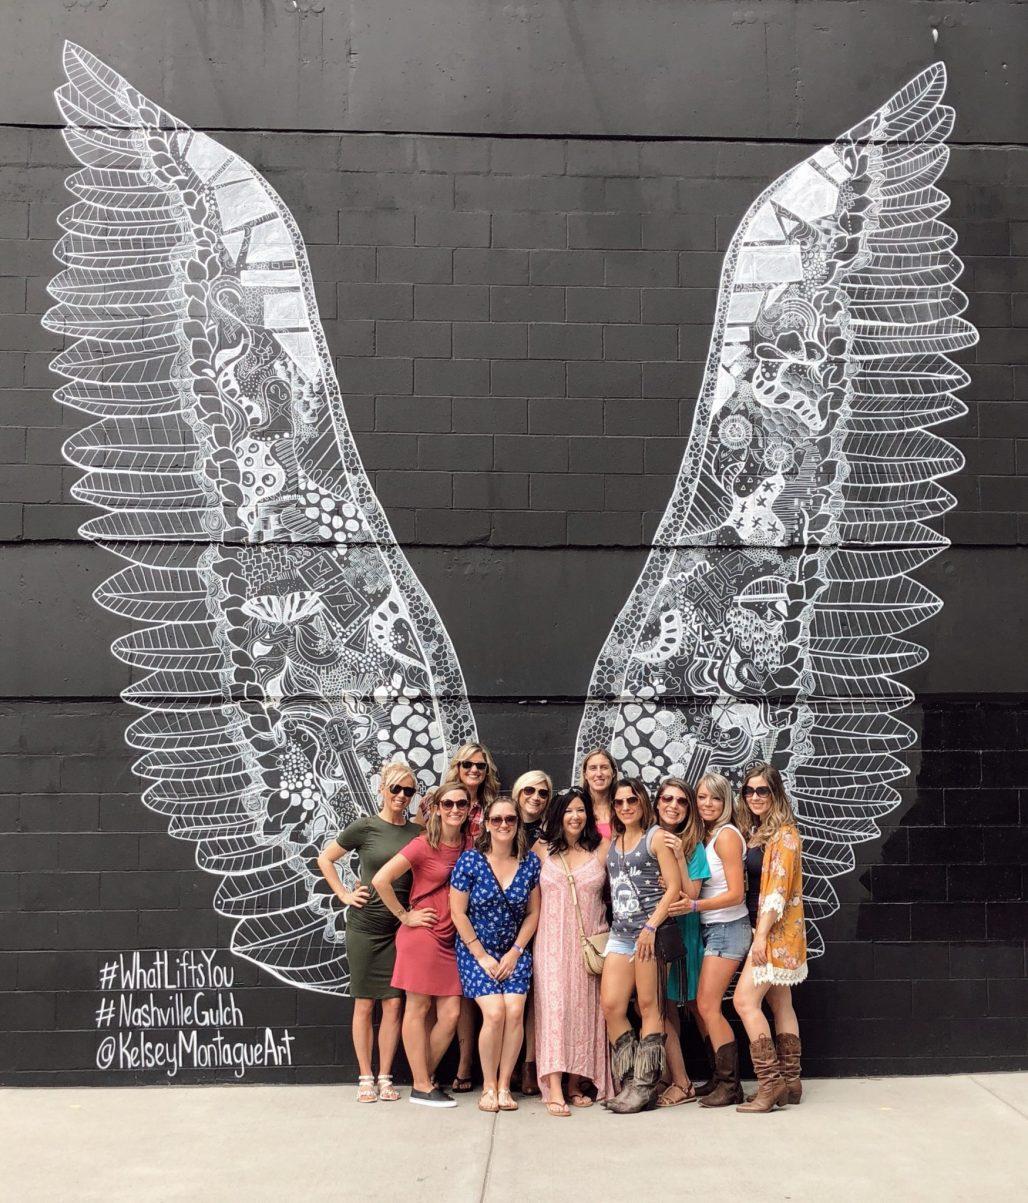 #Visitnashville, nashville hot chicken, nashville airbnb, nashville broadway, nashville bachelorette party, nashville downtown, nashville entertainment, nashville gulch